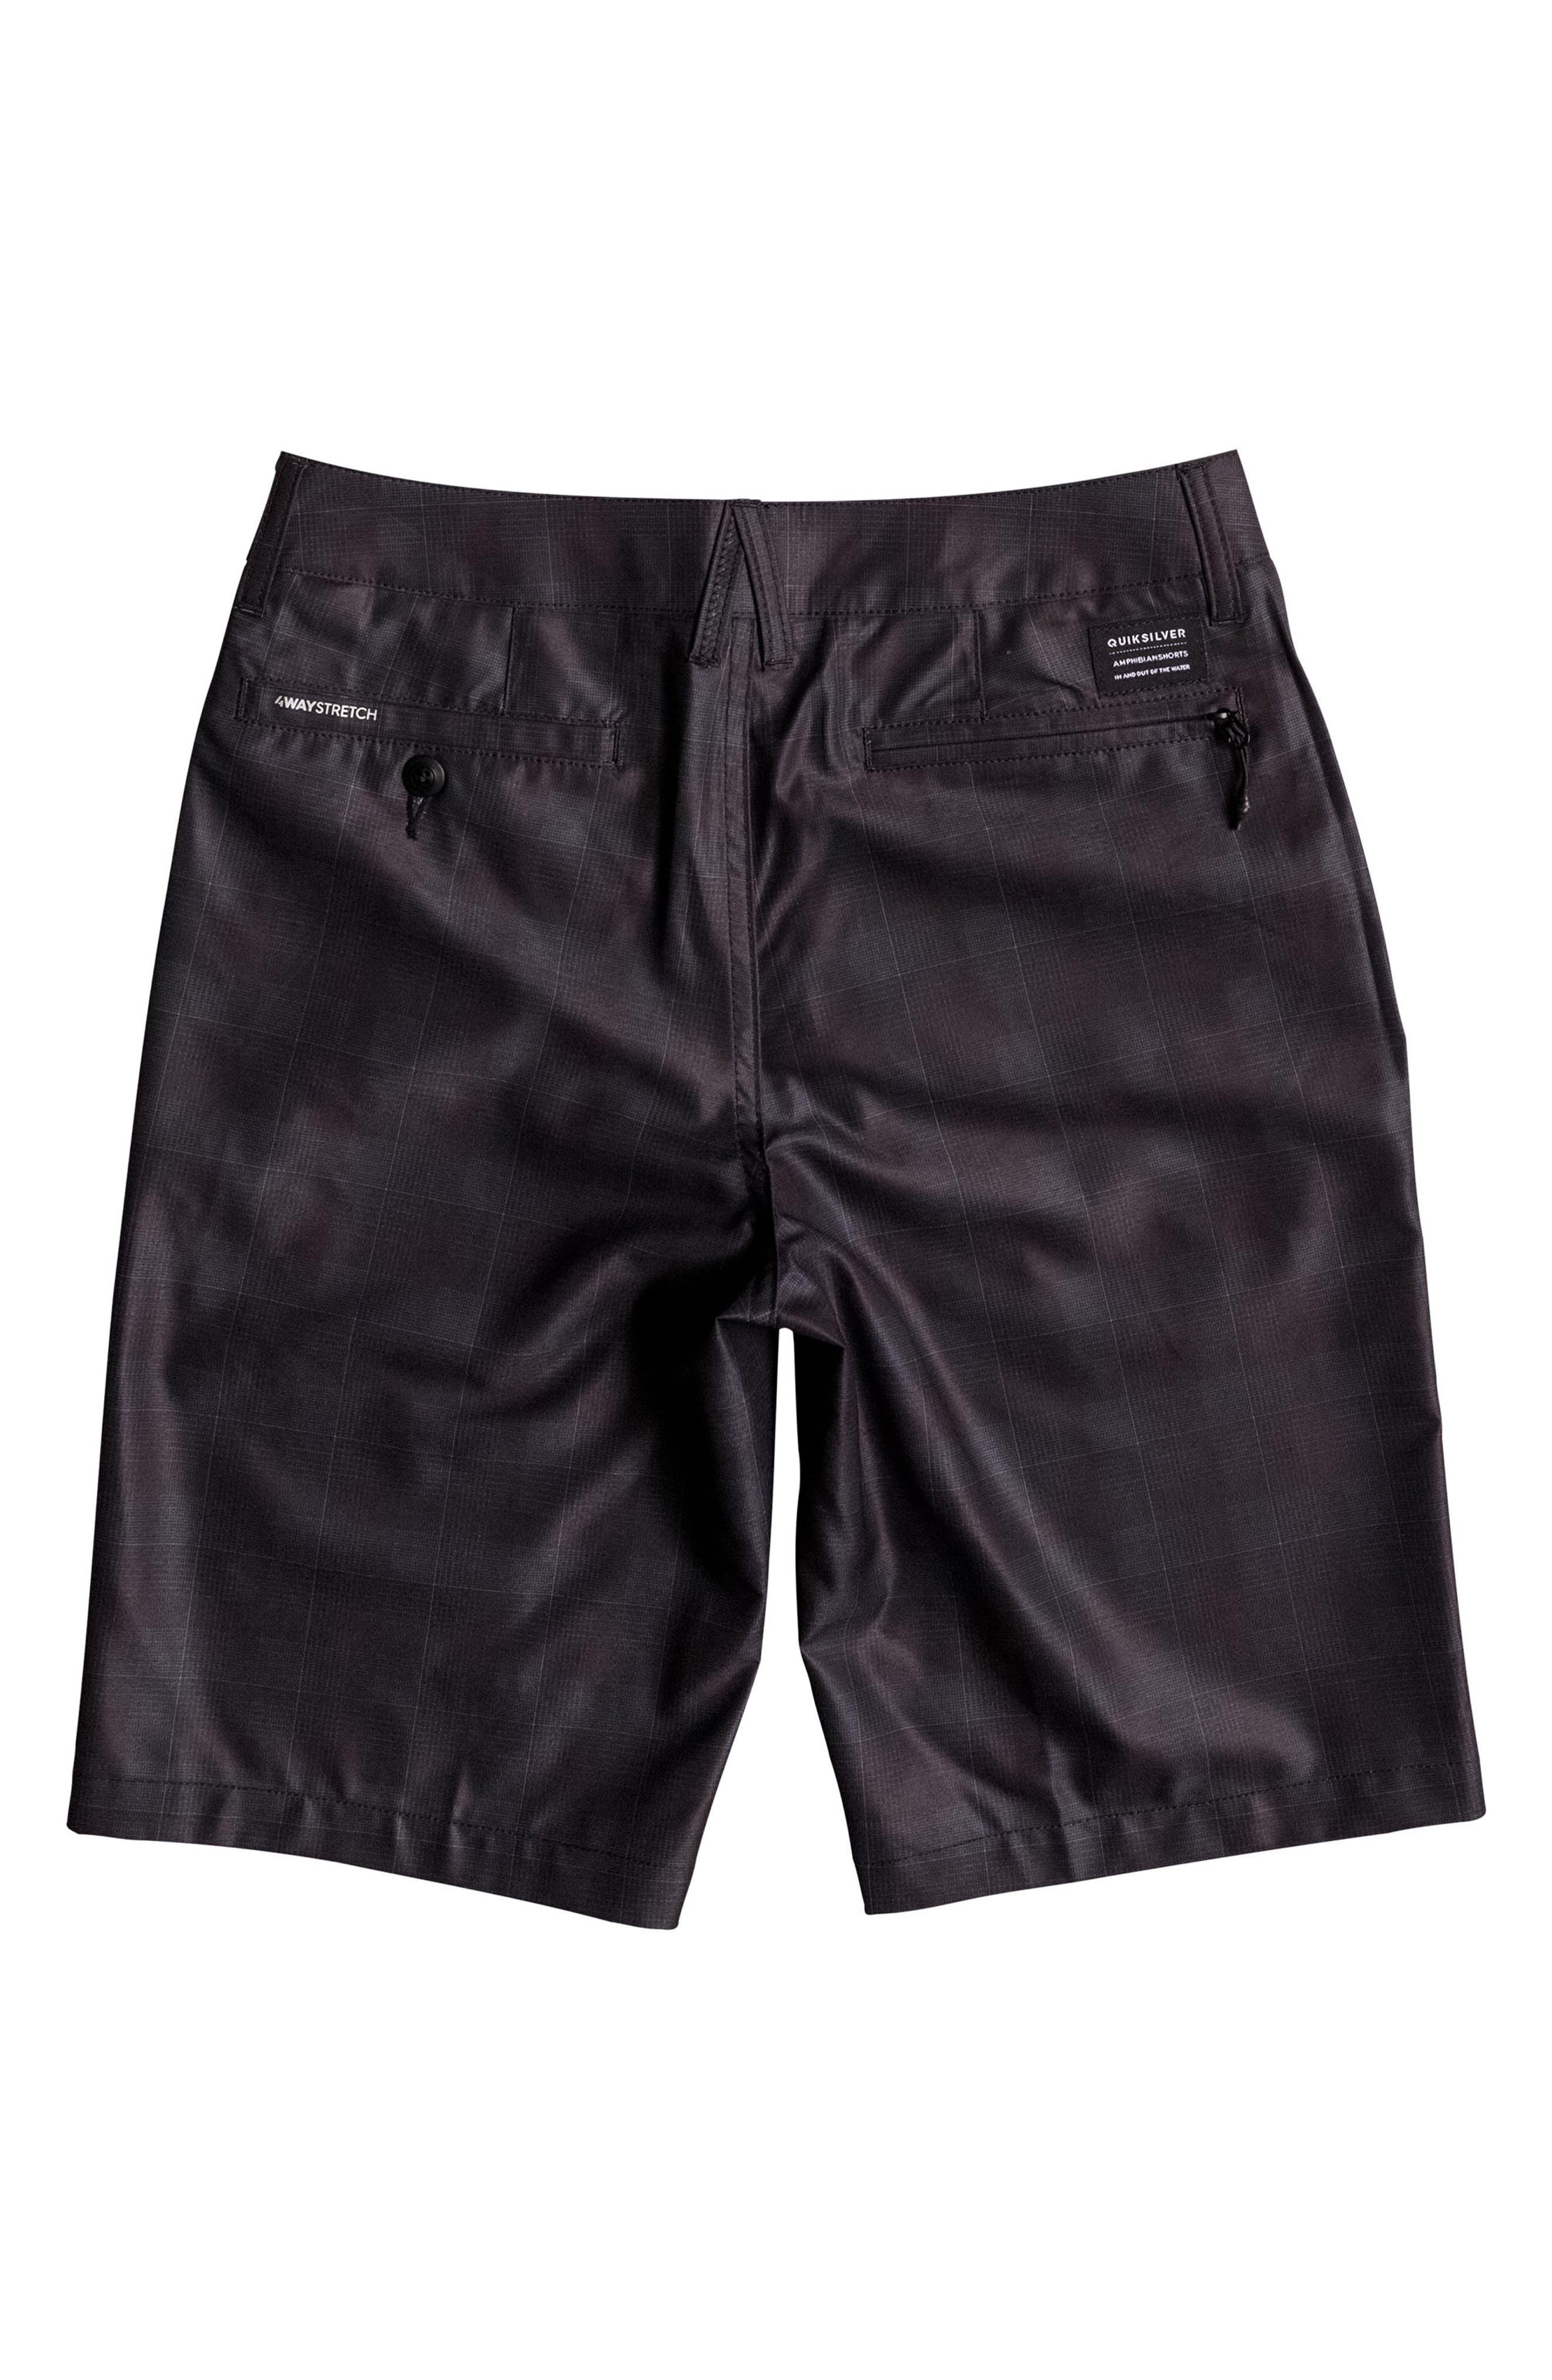 Alternate Image 2  - Quiksilver Union Plaid Amphibian Hybrid Shorts (Big Boys)